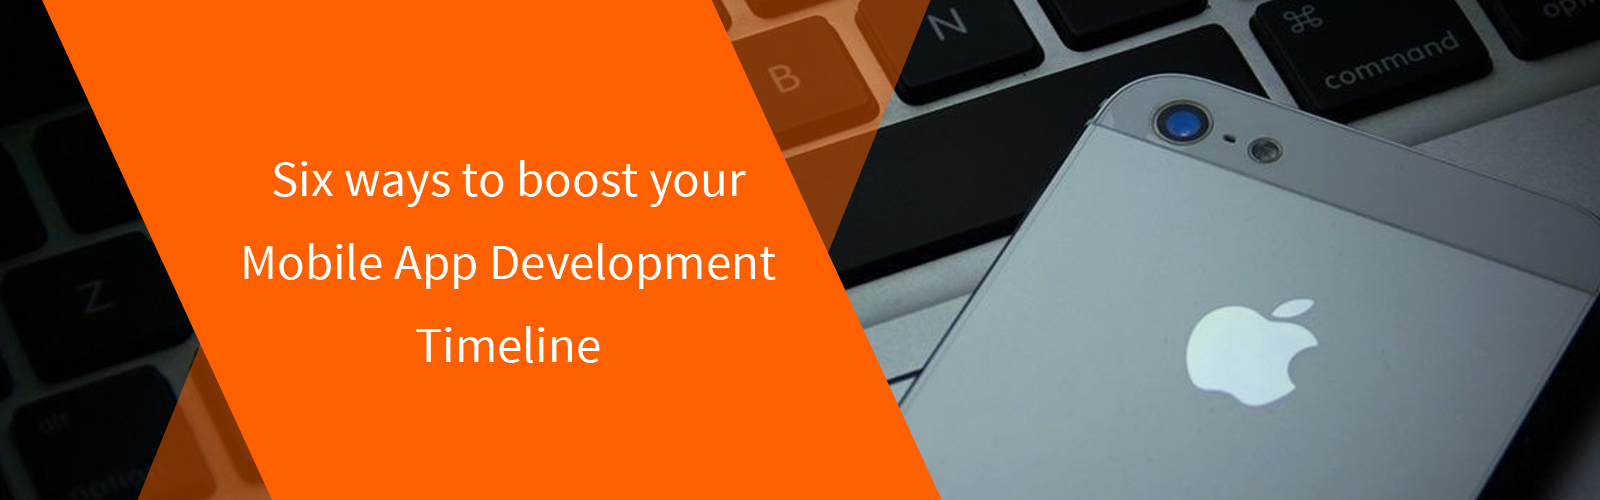 boost your Mobile App Development